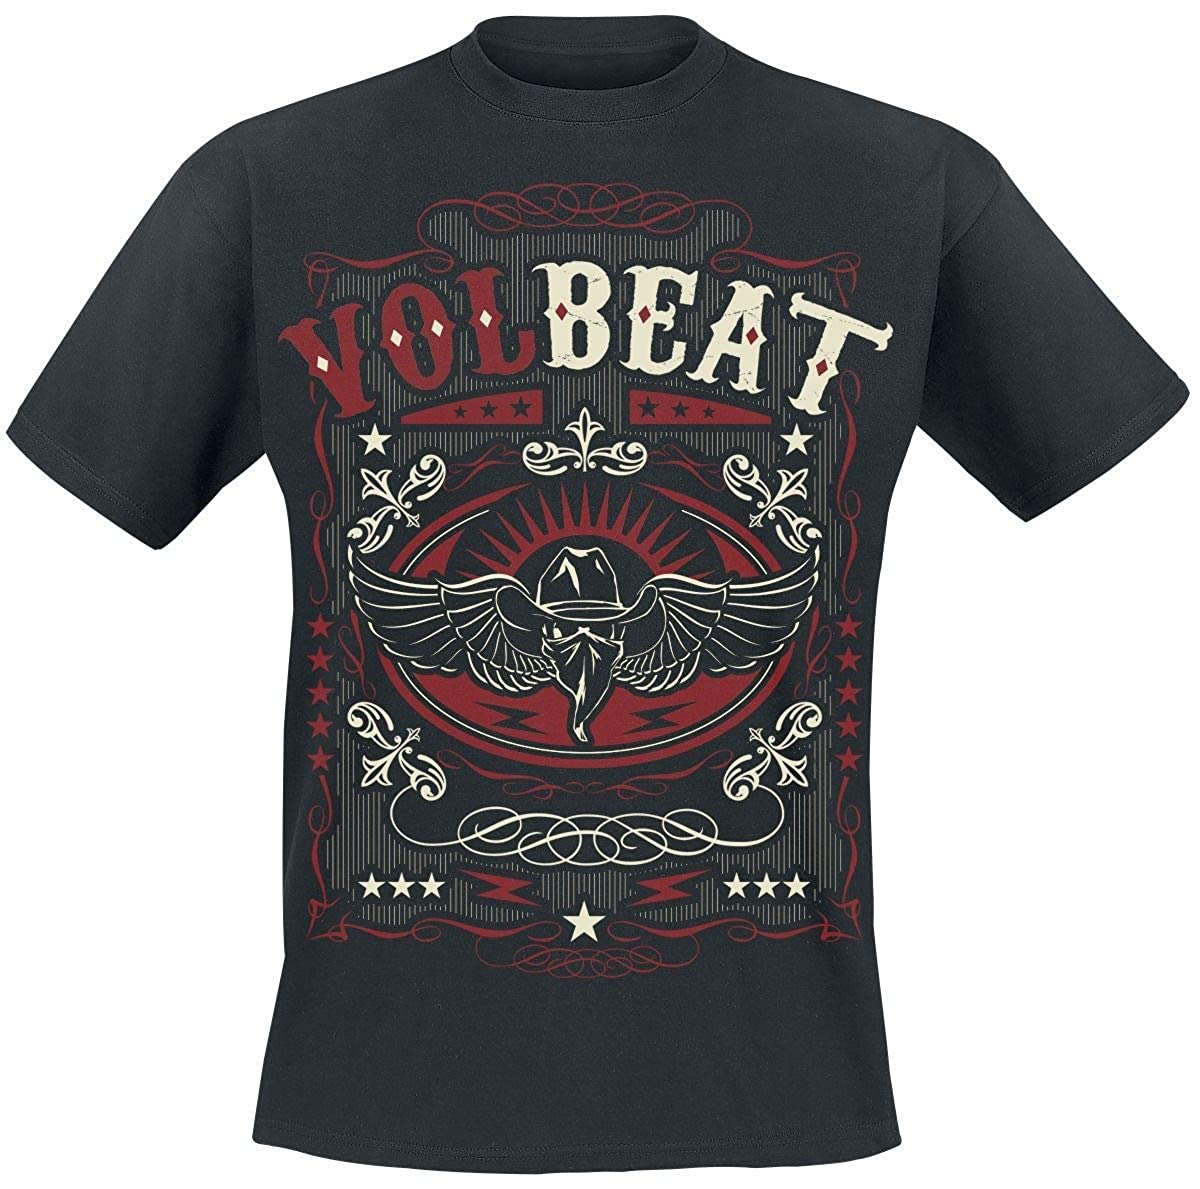 Western Wings Black T-Shirt VOLBEAT